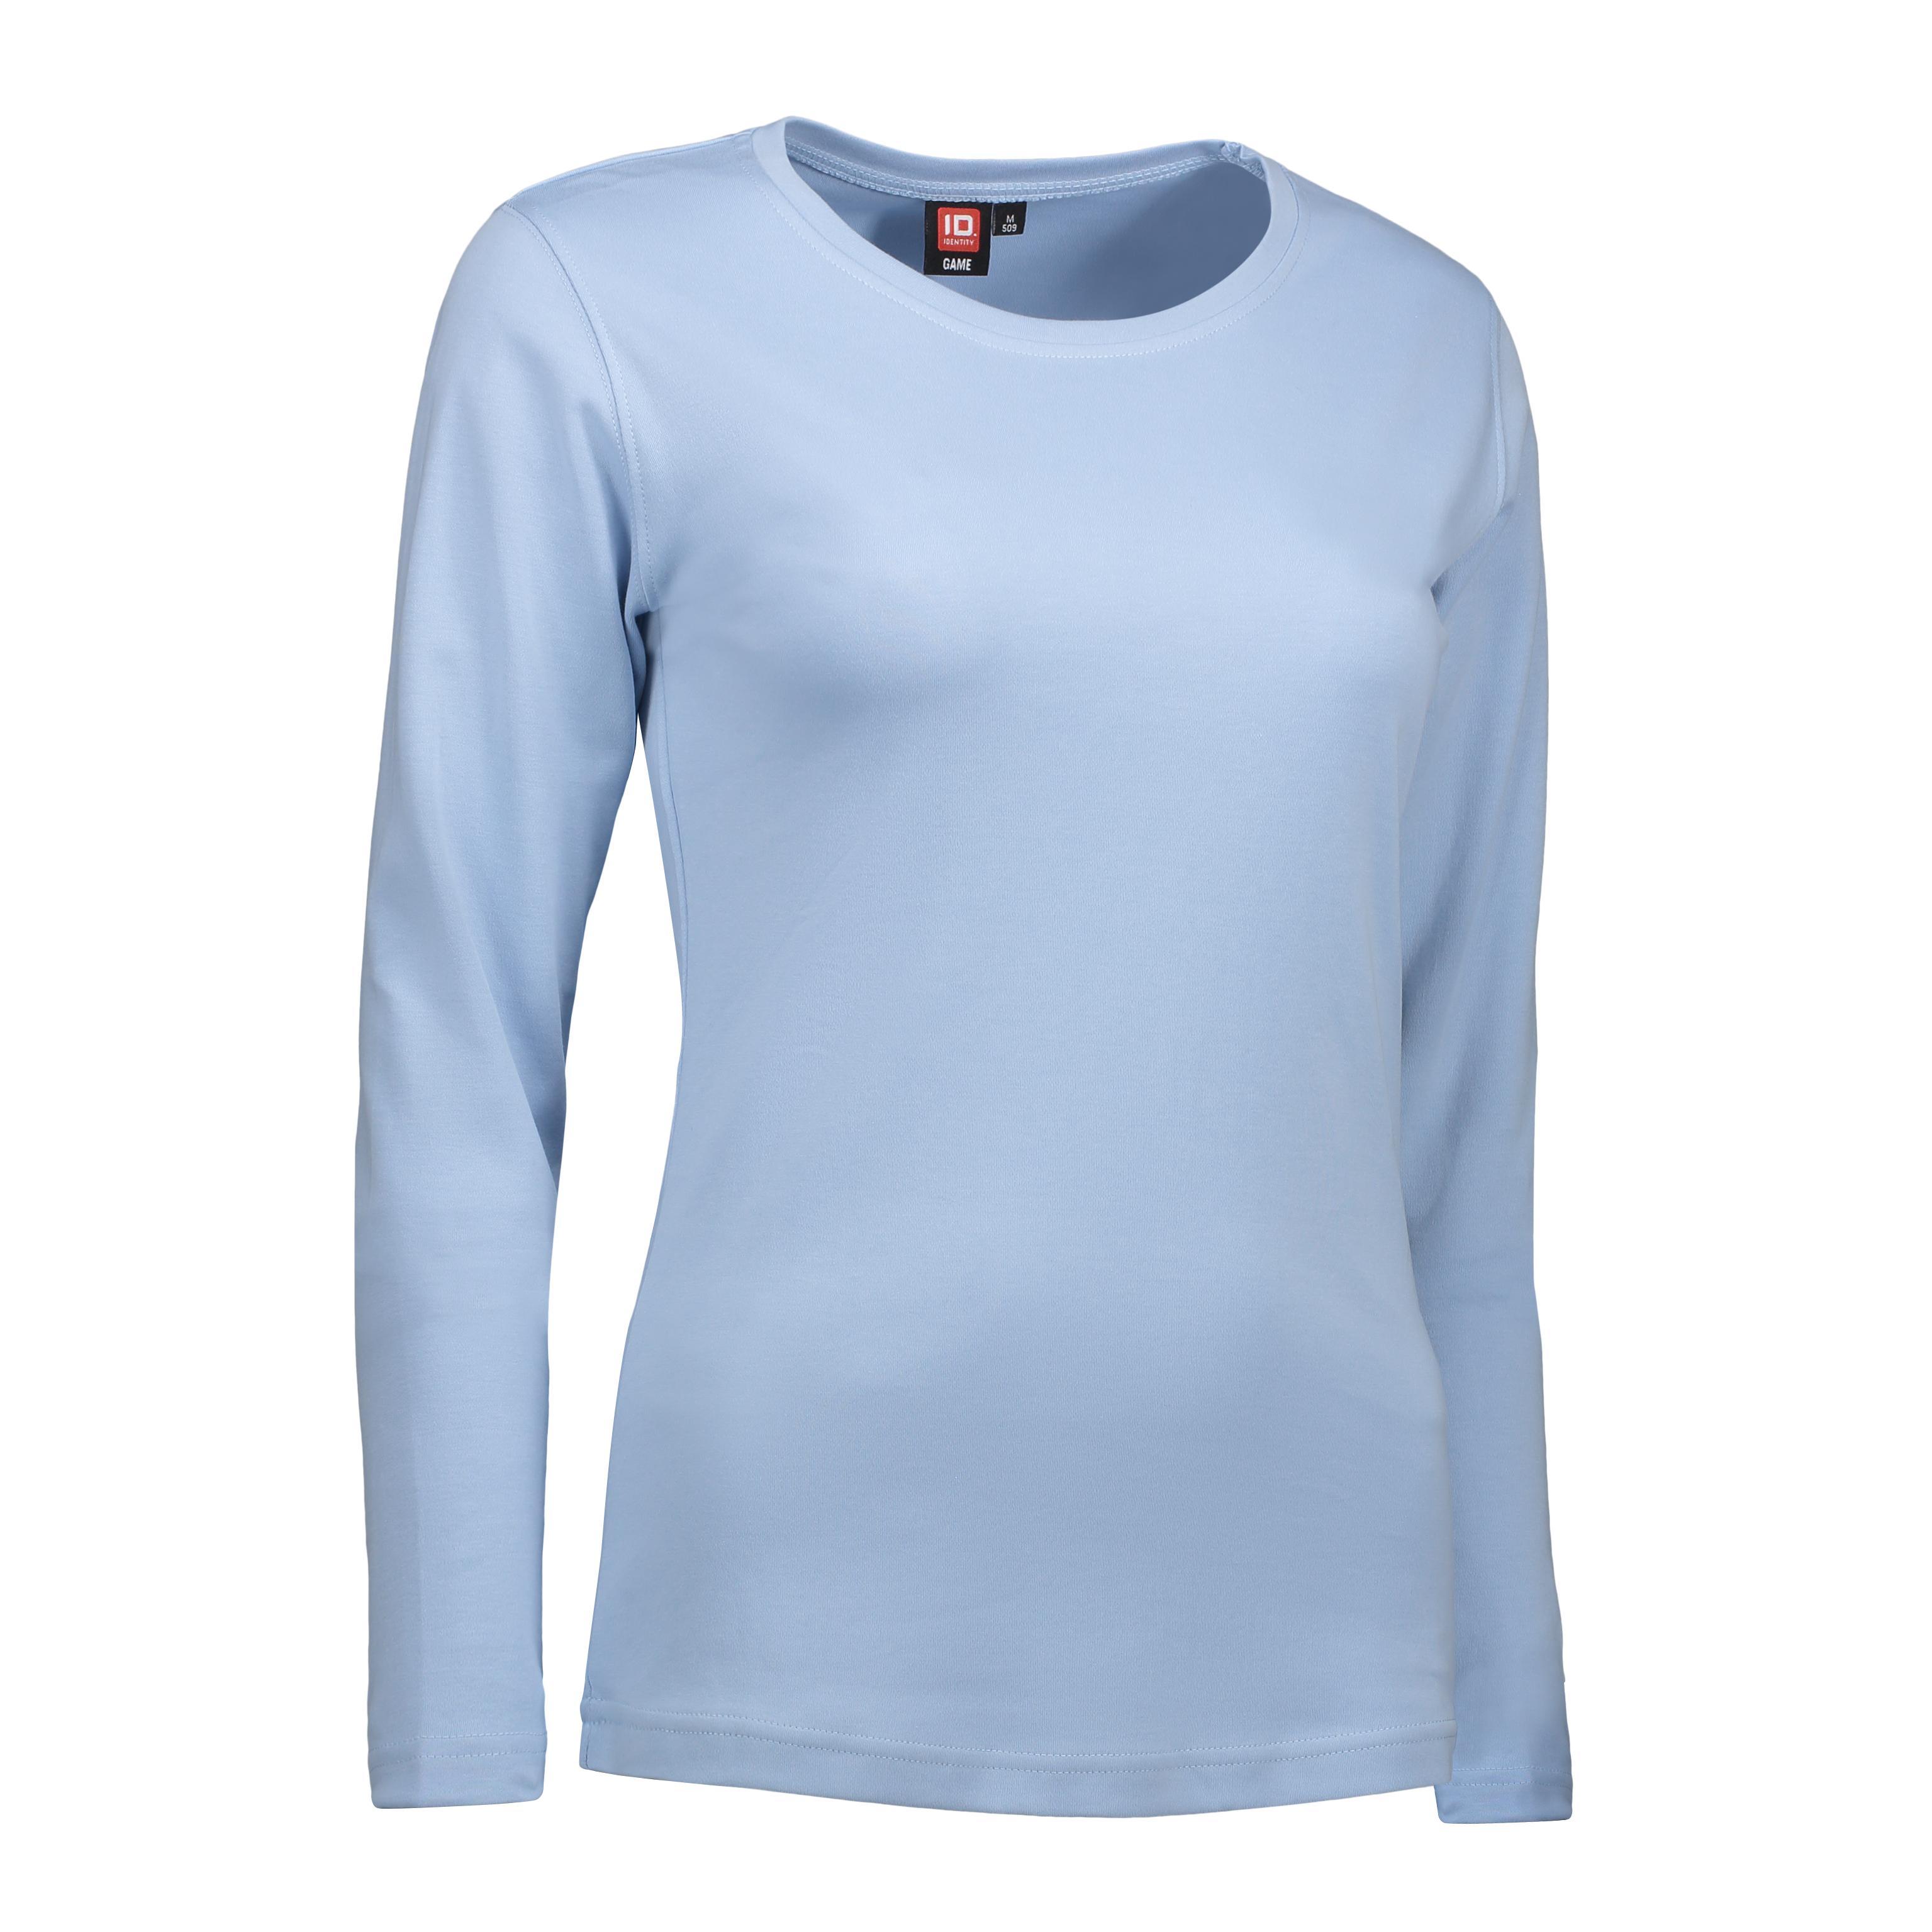 ID Interlock dame T shirt|langærm 0509